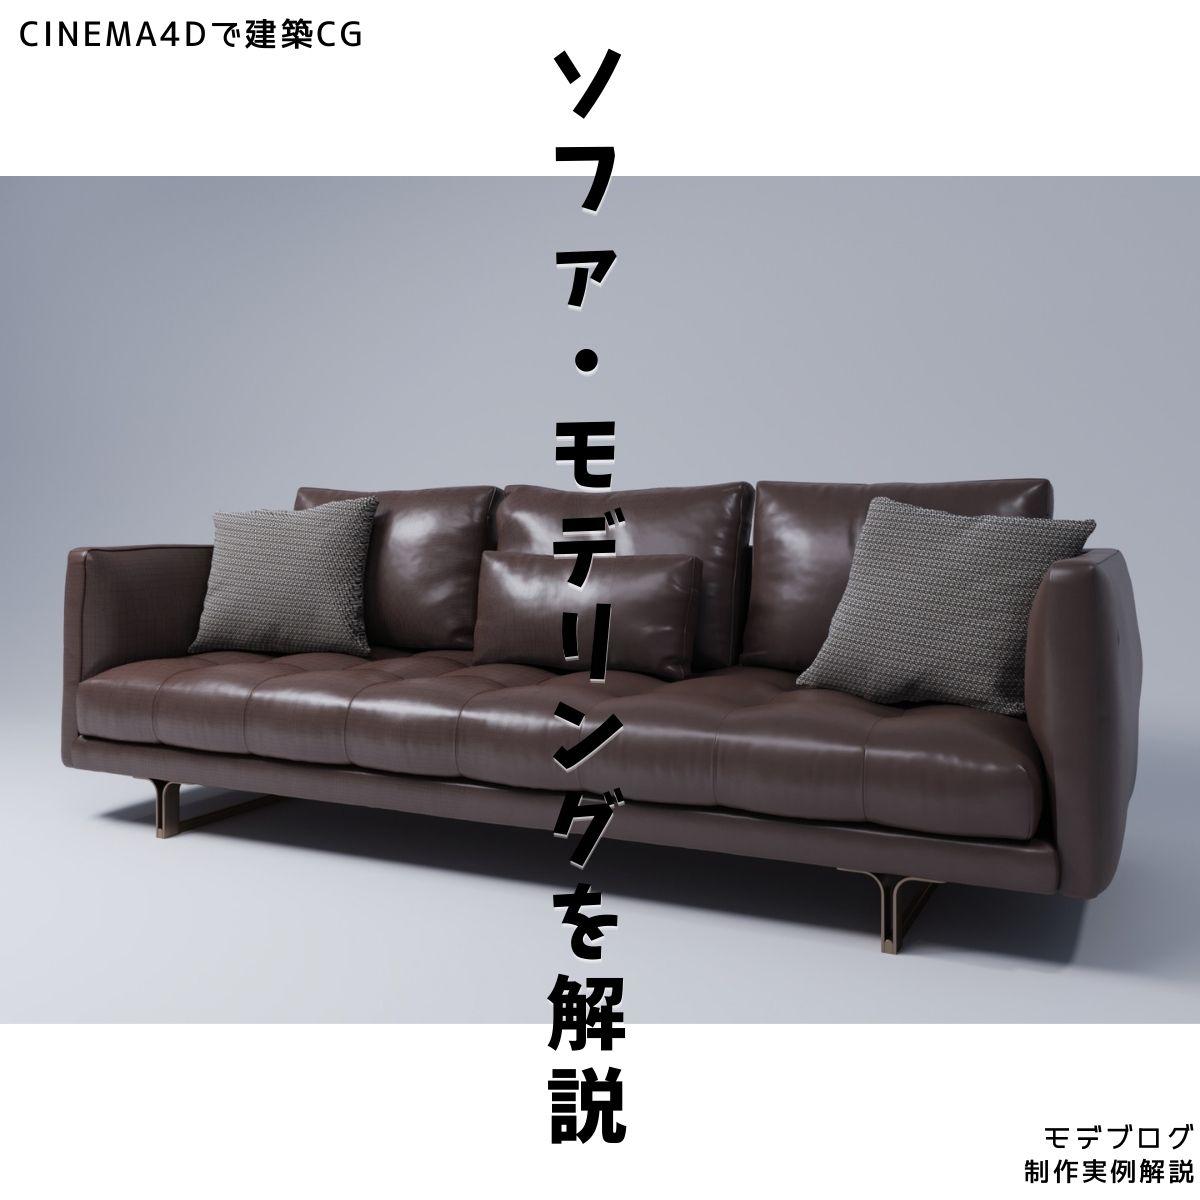 【Cinema4D】 ソファ・モデリングを解説【チュートリアル】